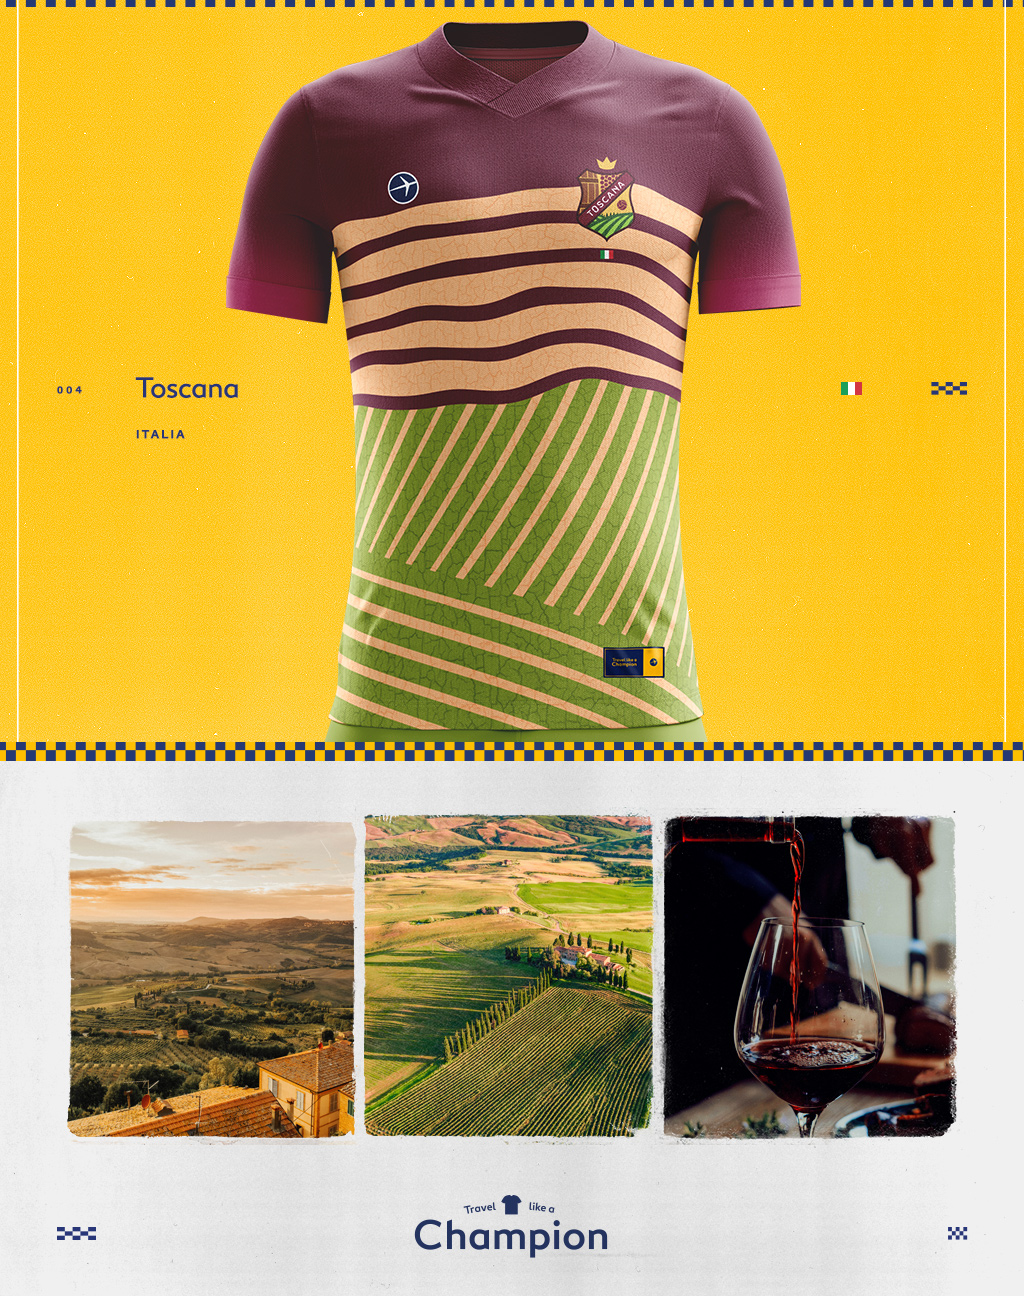 004-toscana-blog-article-1024x1296-it.jpg?1556235304